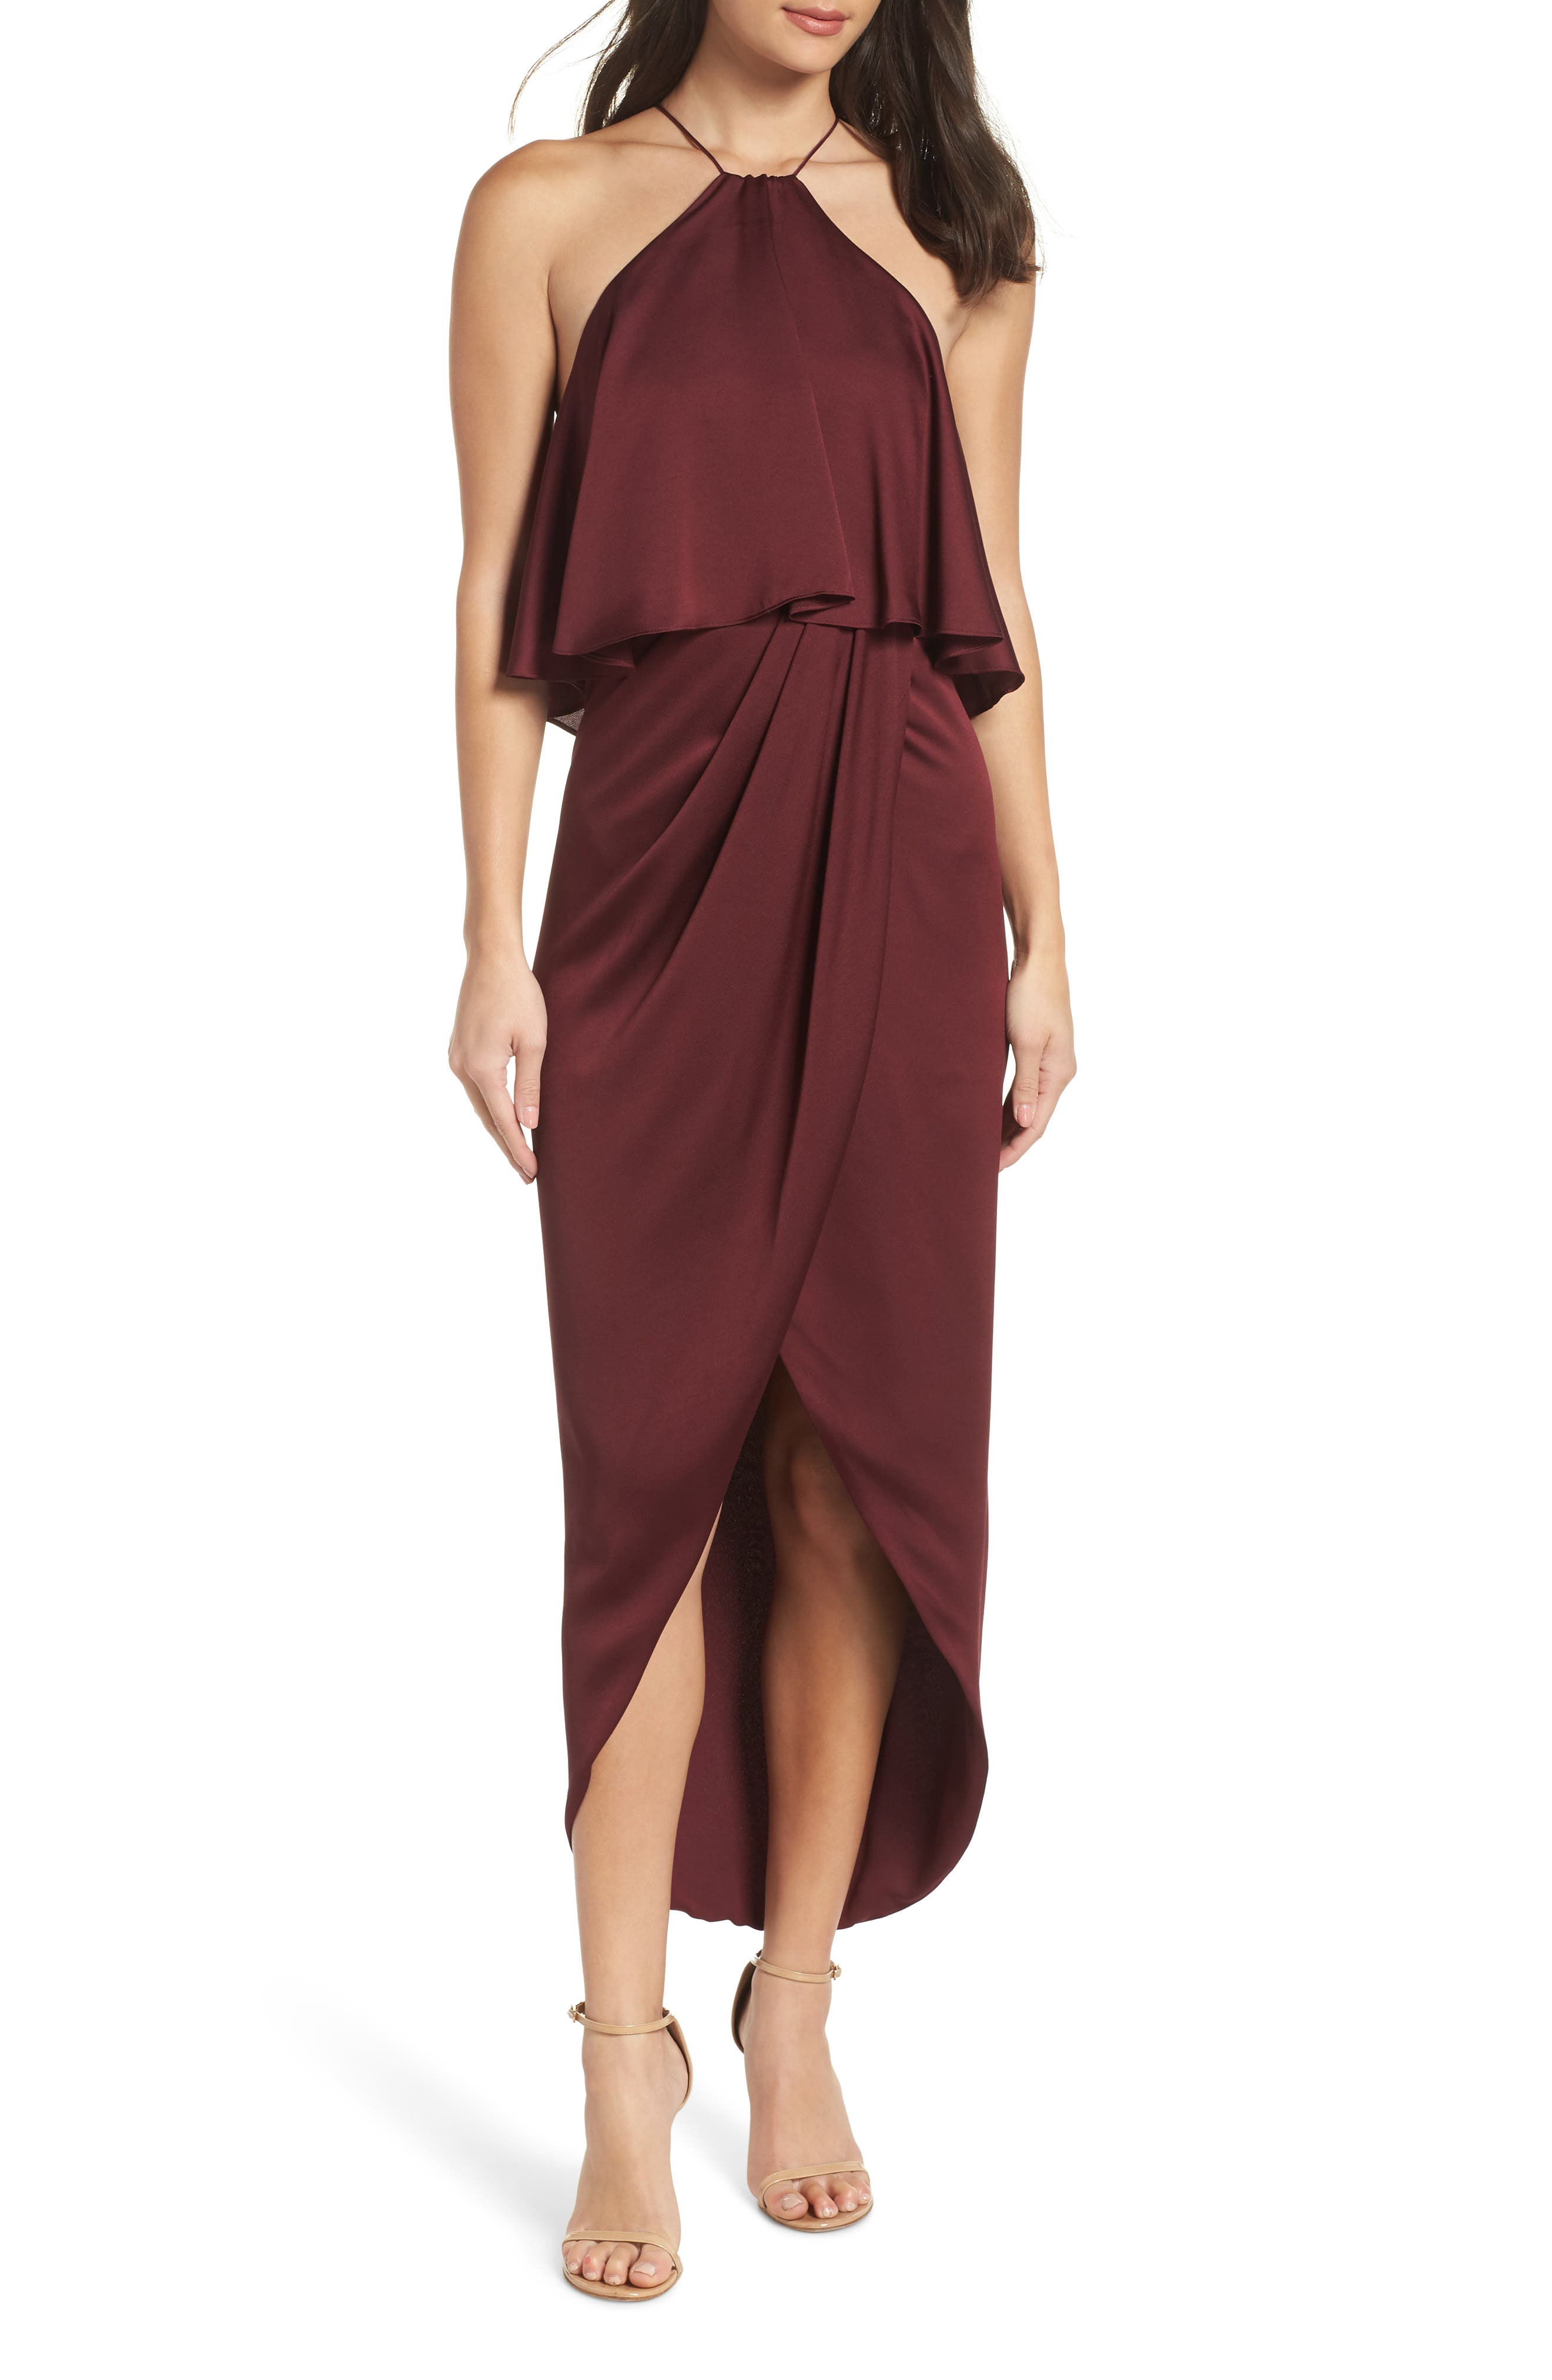 Shona Joy Ruffle Halter Tulip Gown, Burgundy